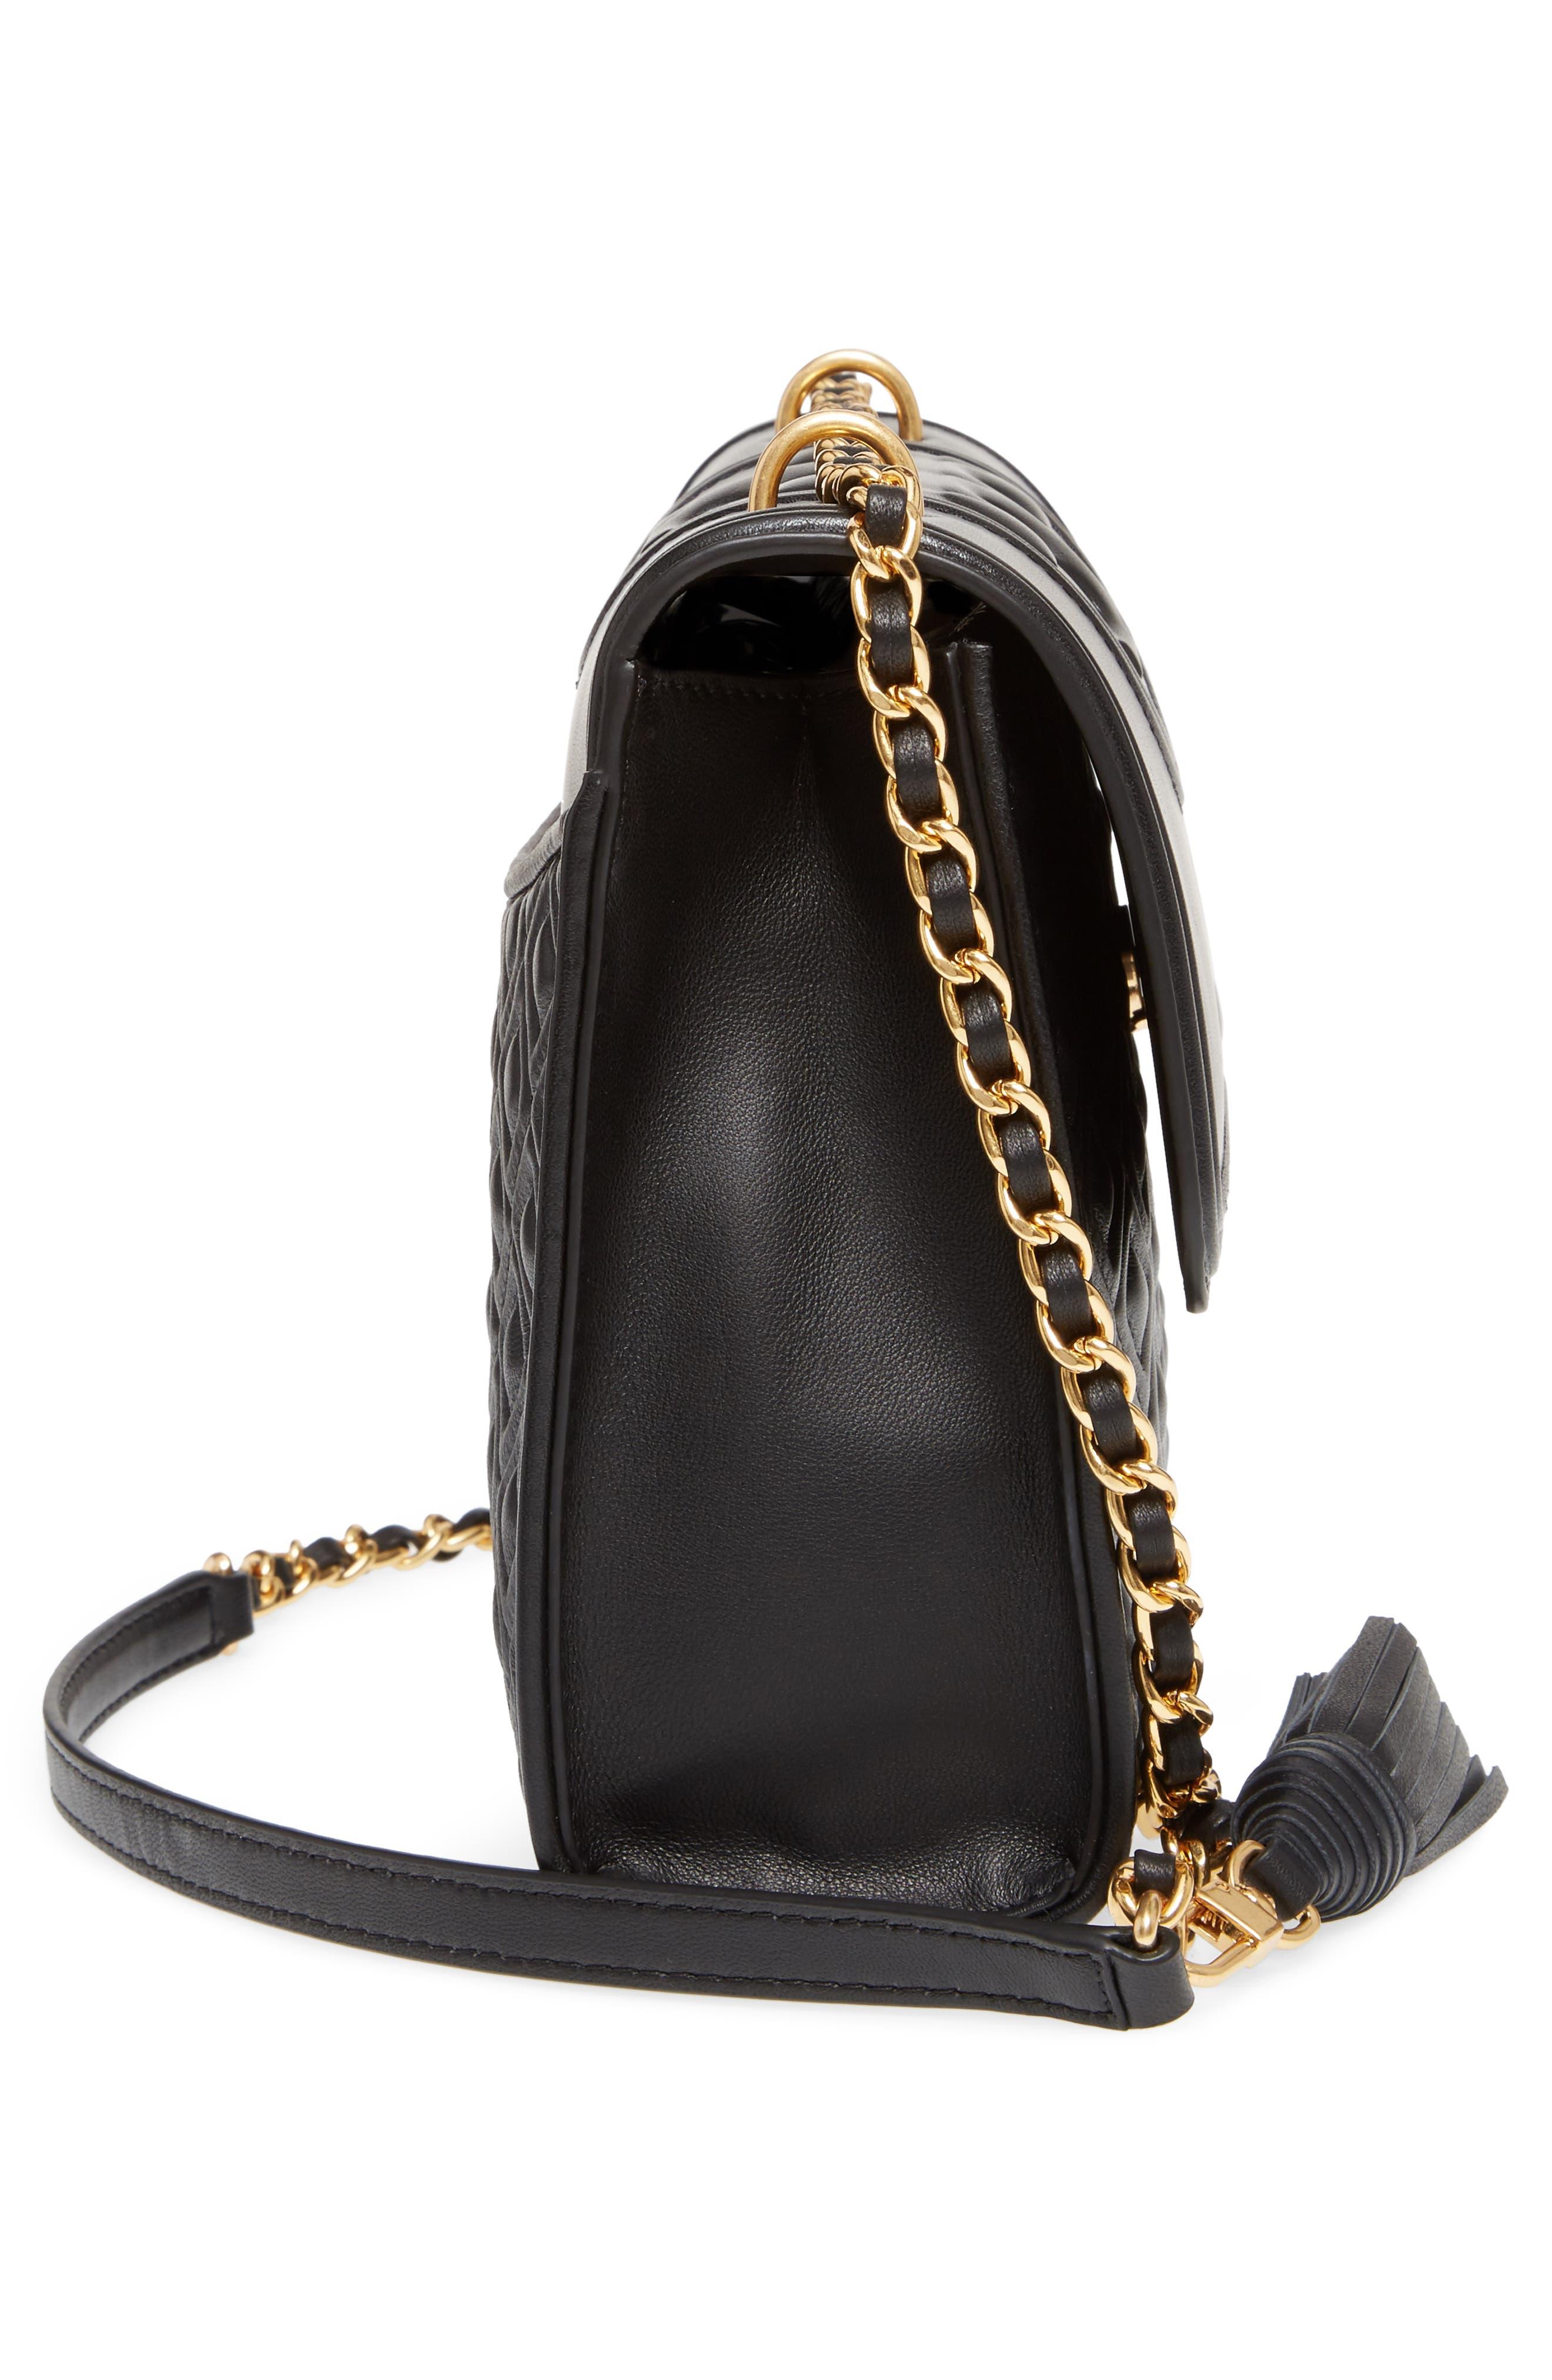 TORY BURCH, Fleming Leather Convertible Shoulder Bag, Alternate thumbnail 6, color, BLACK